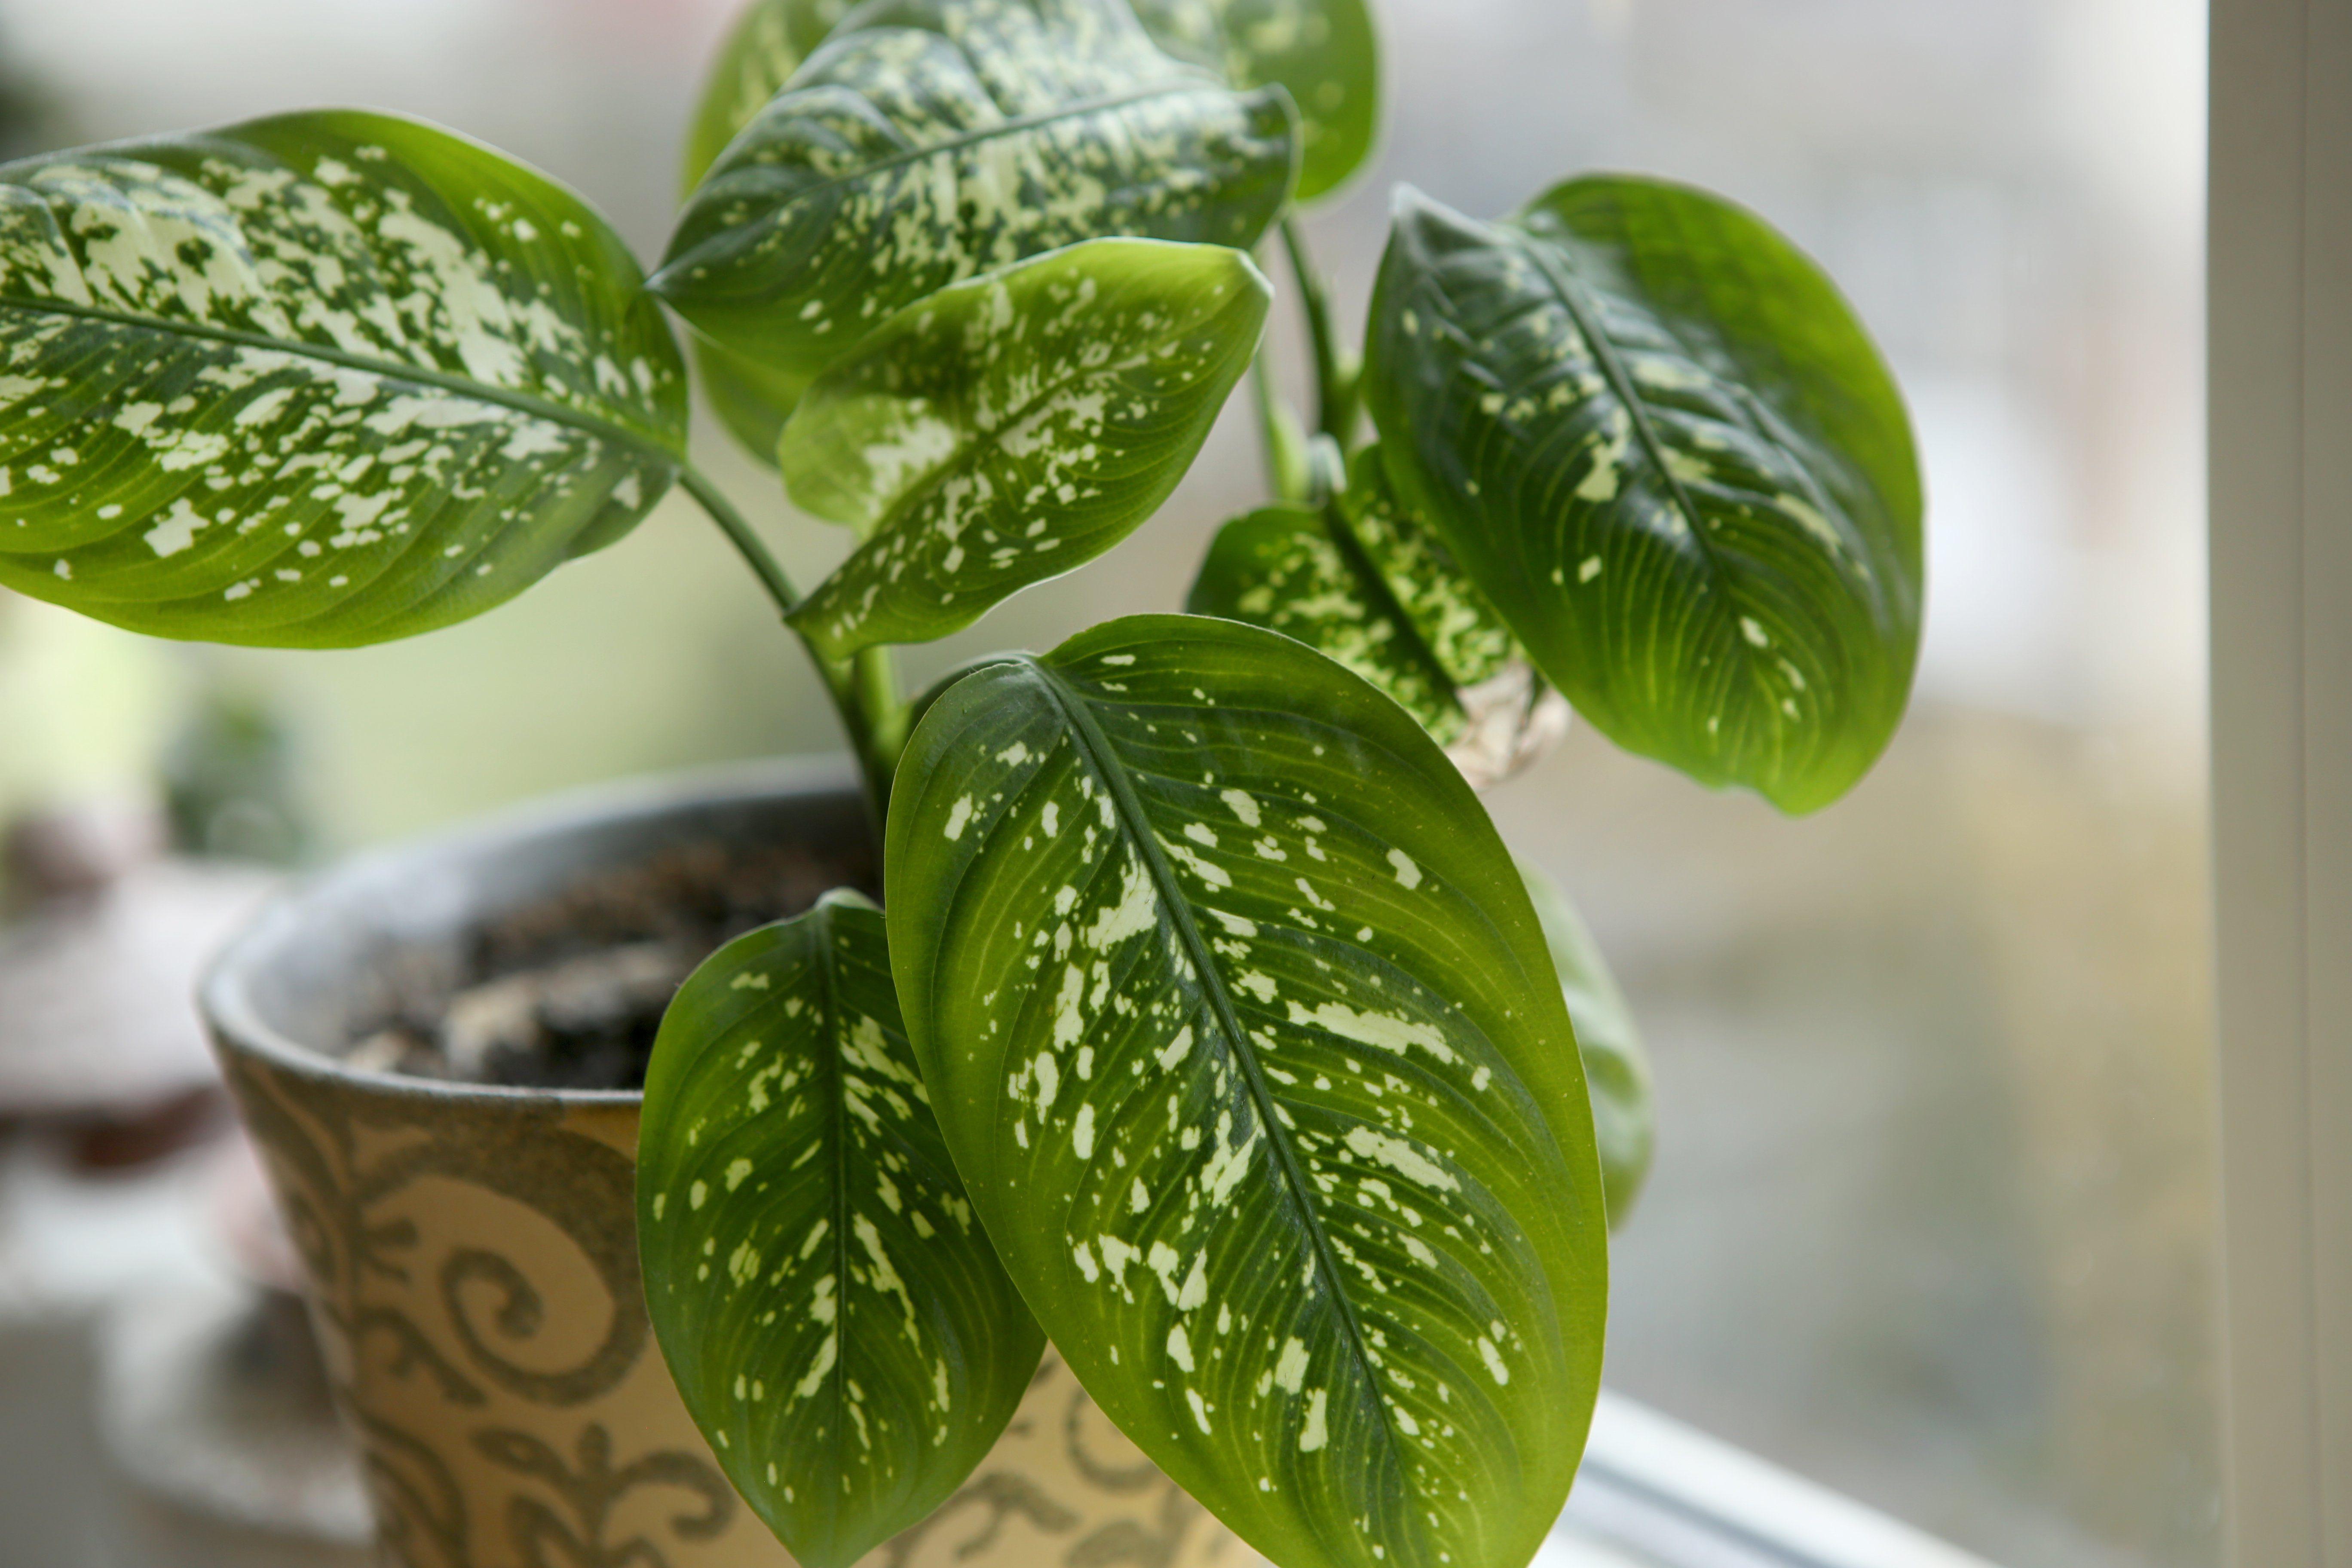 Dieffenbachia houseplant near window.